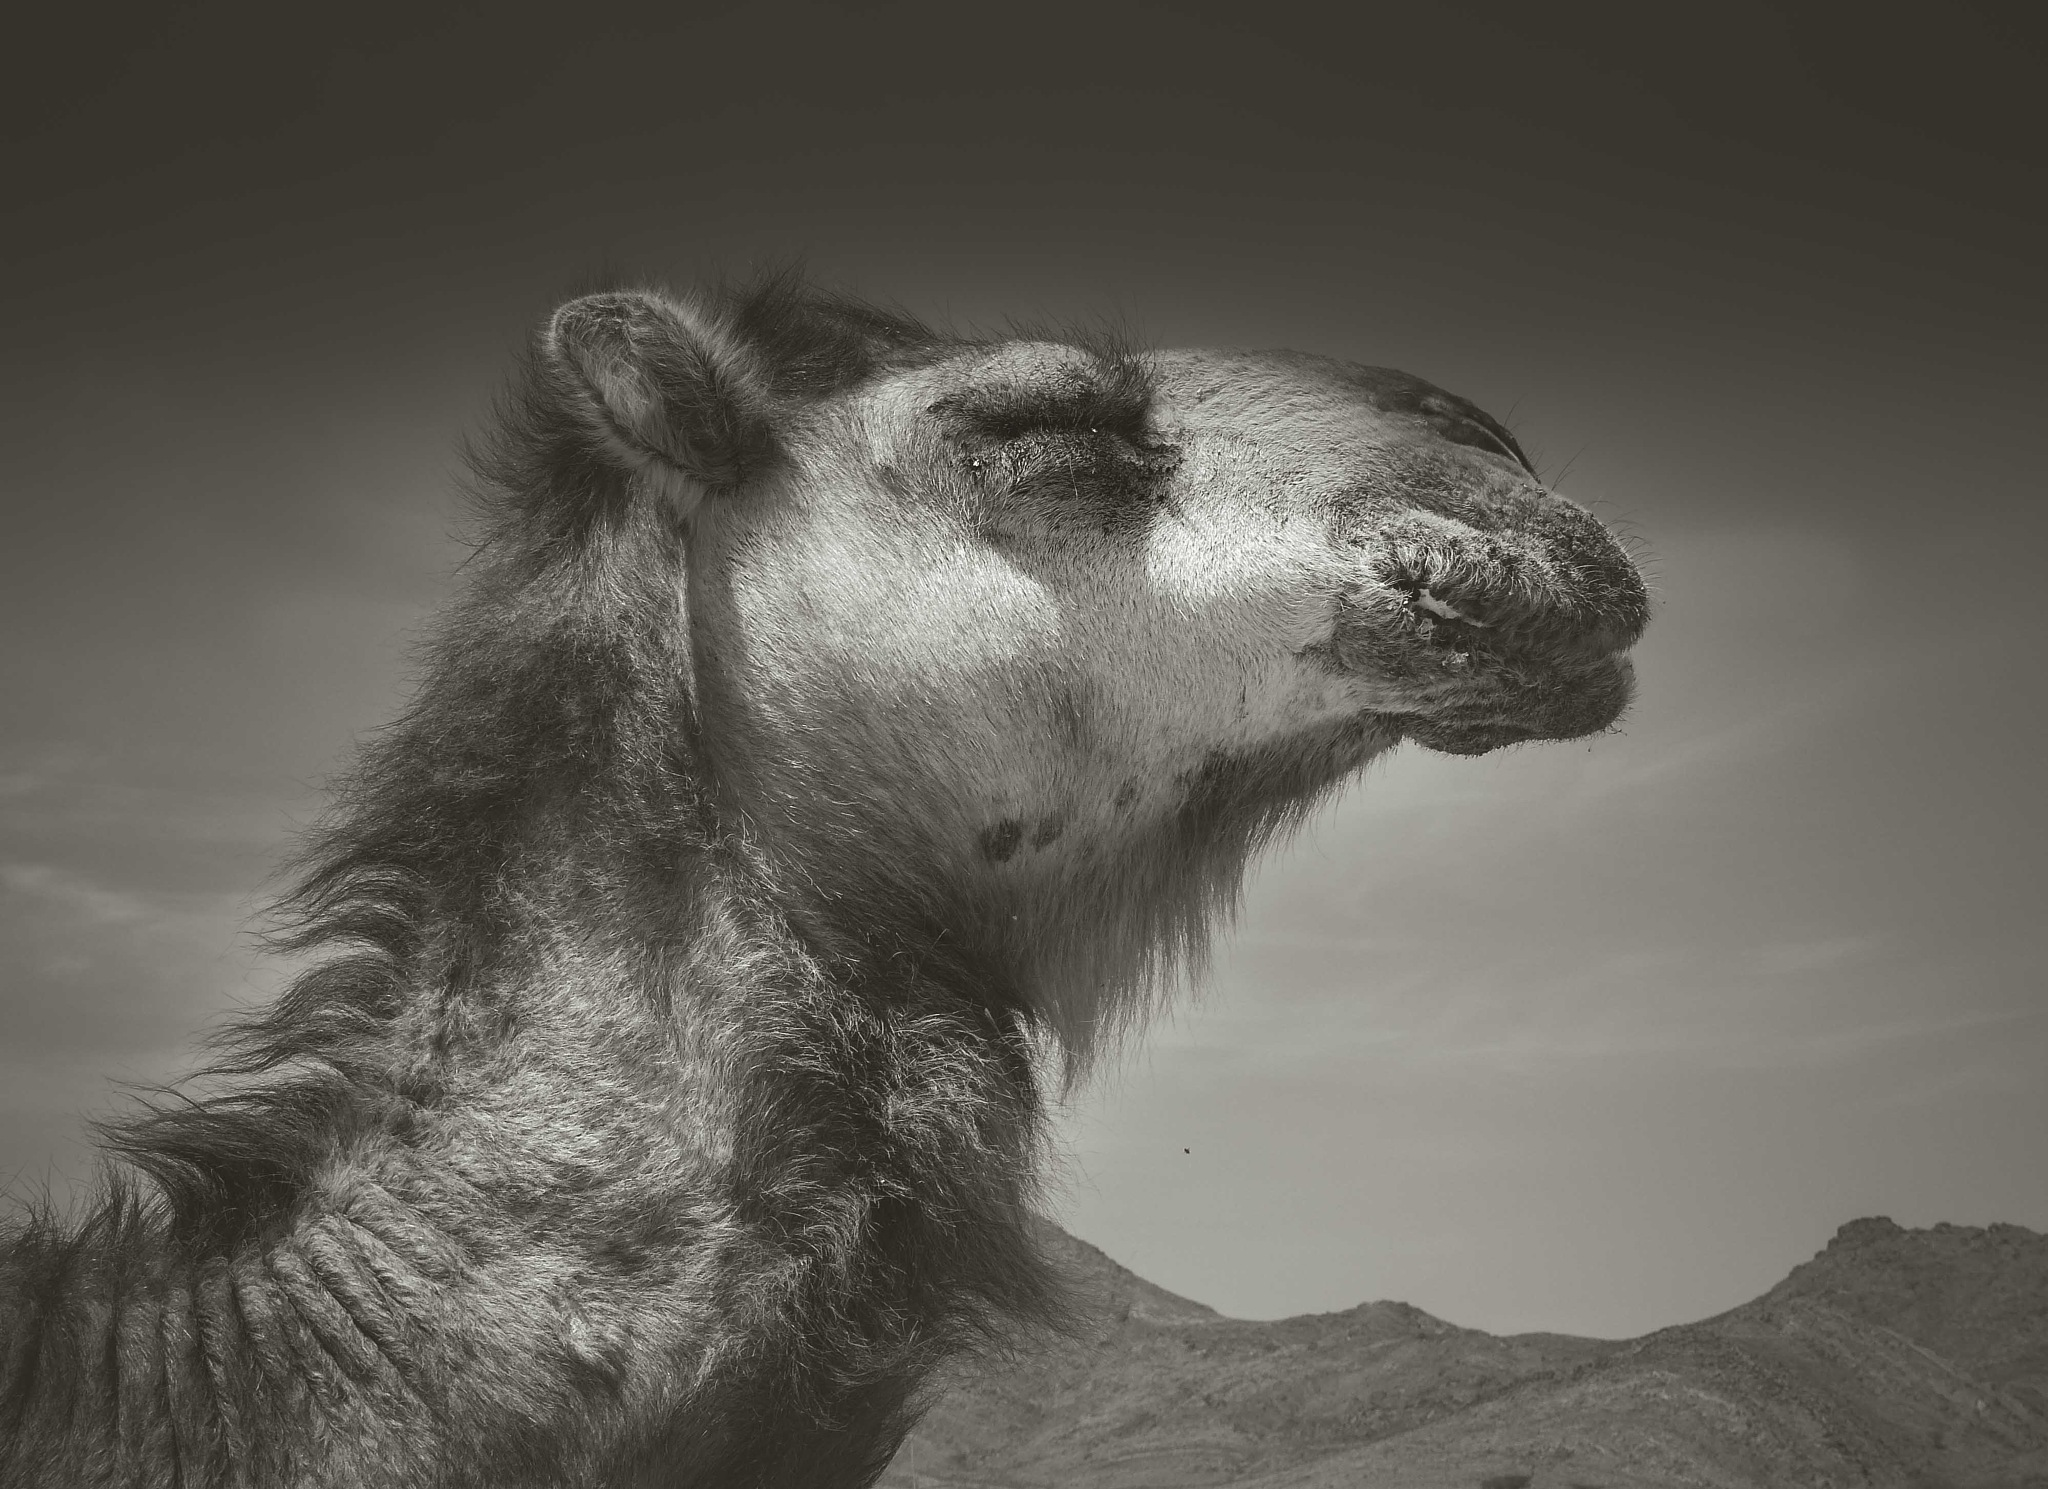 camel by Mohcine Rabhi